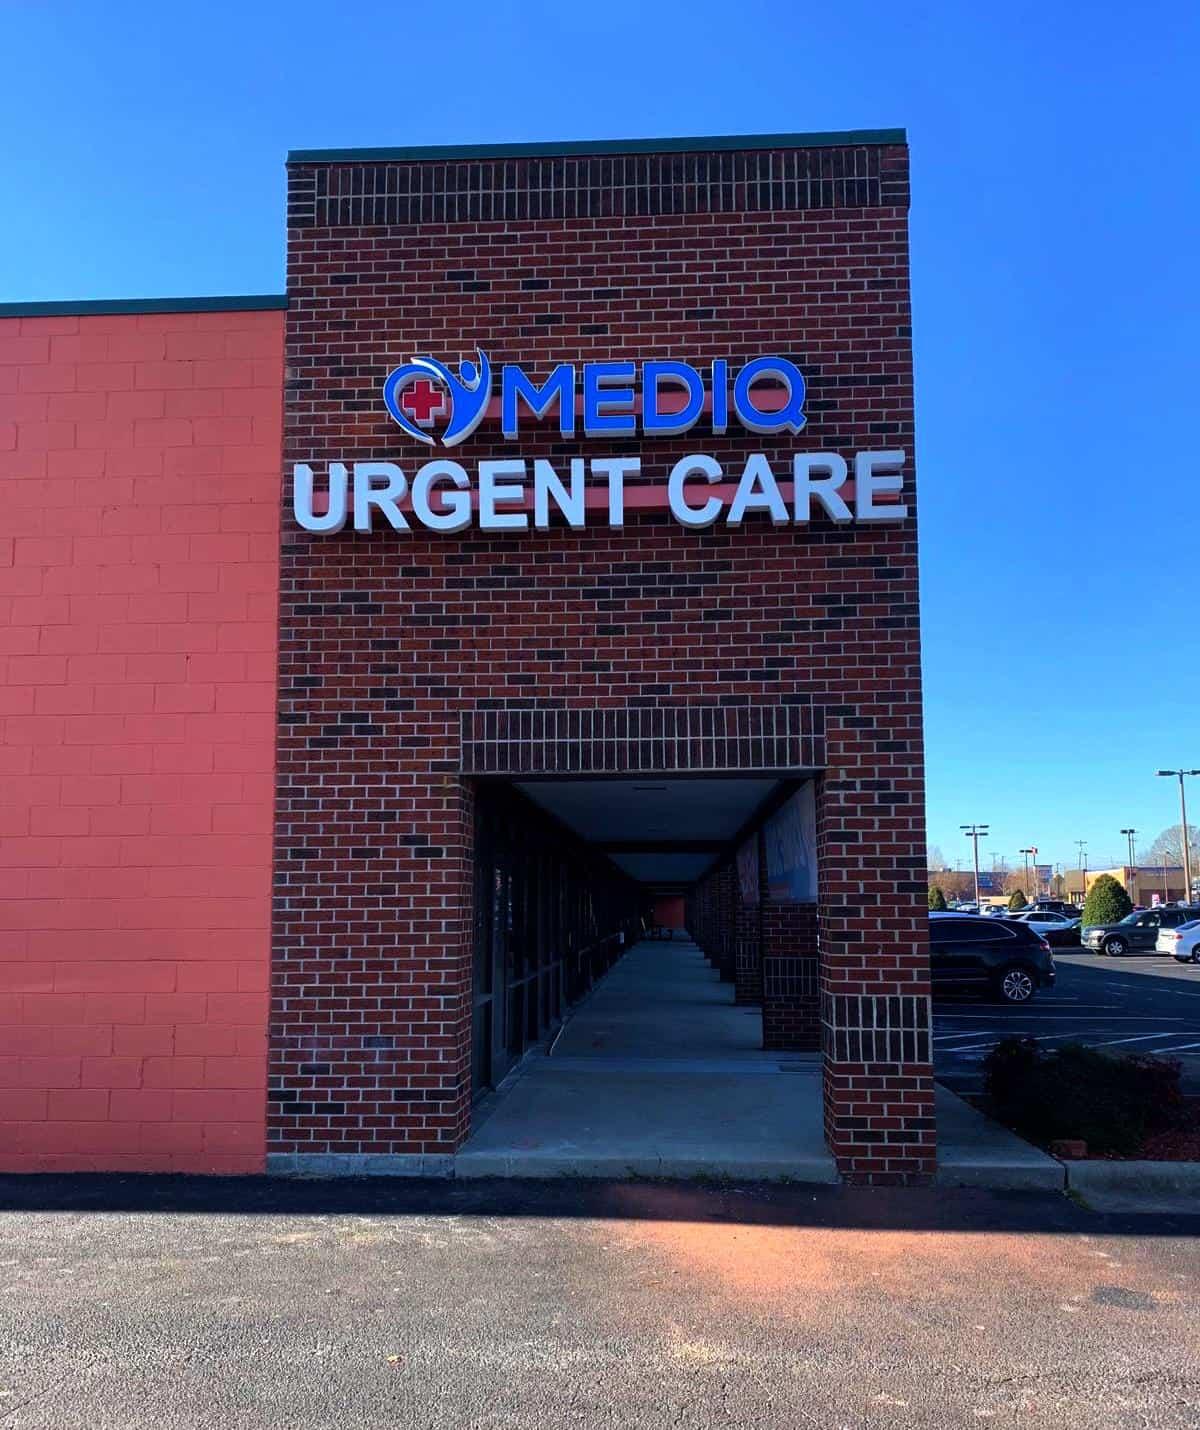 Archdale Urgent Care MEDIQ exterior